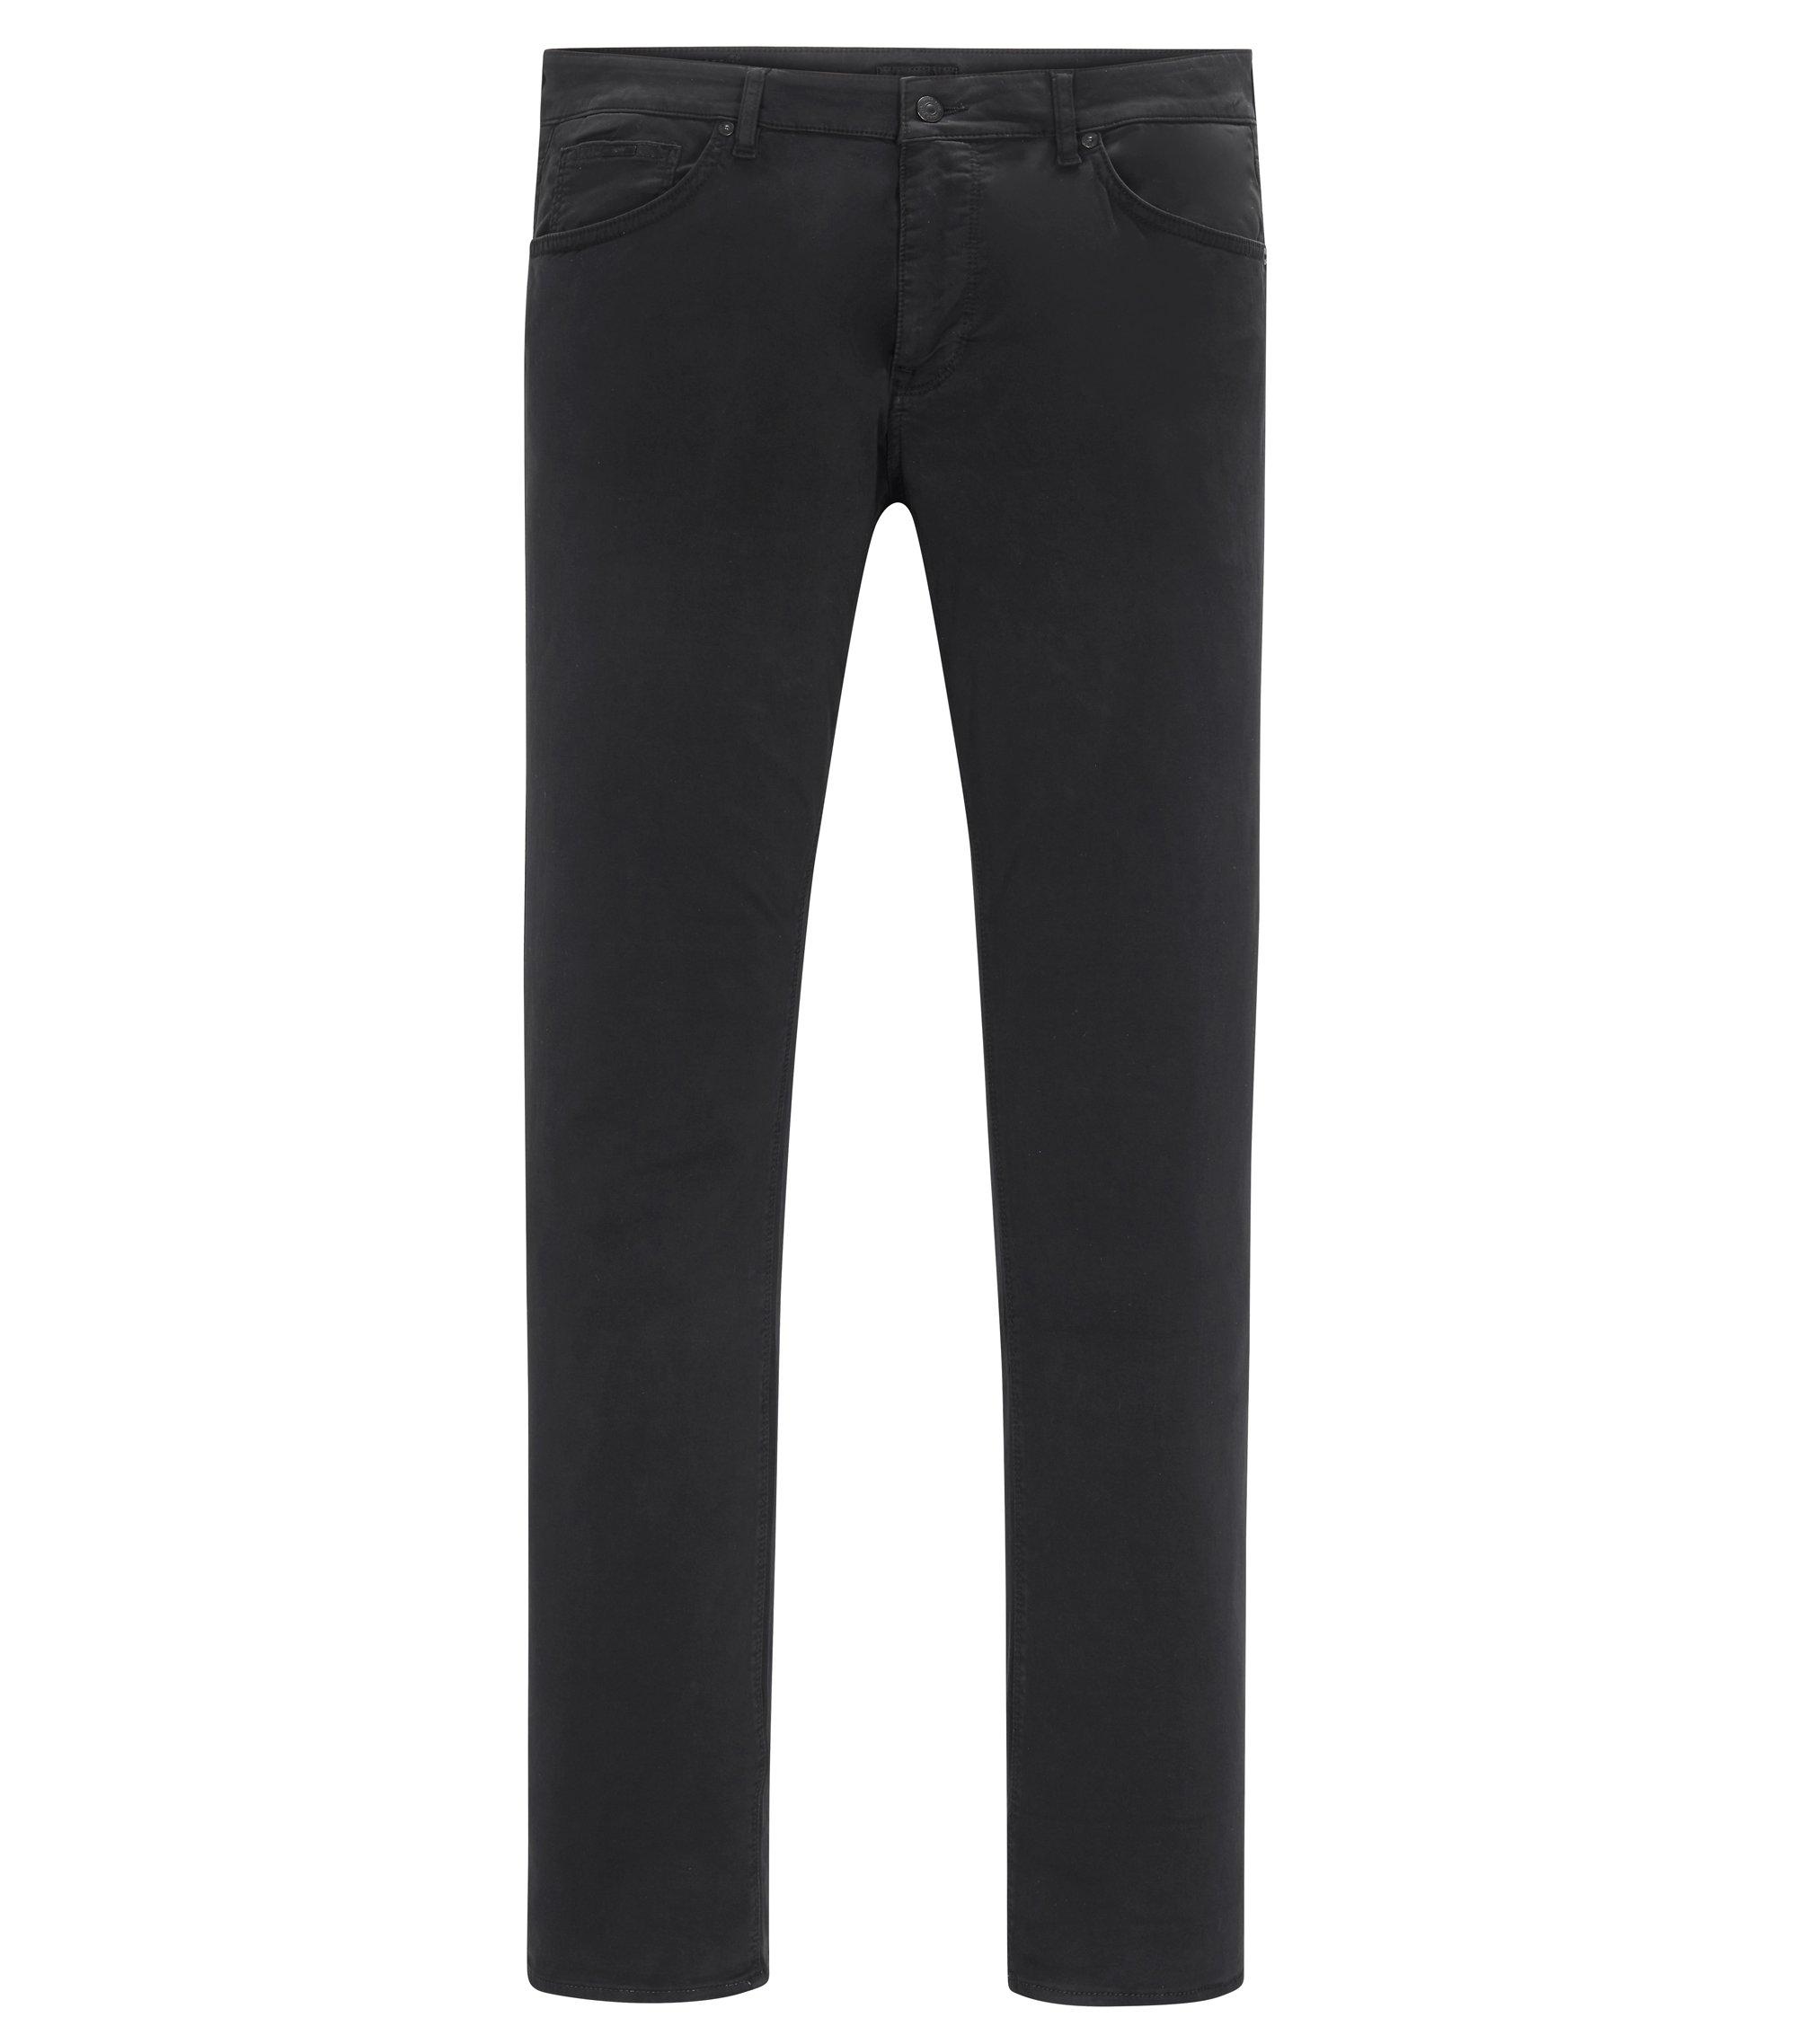 Stretch Cotton Pant, Regular Fit | Maine, Black